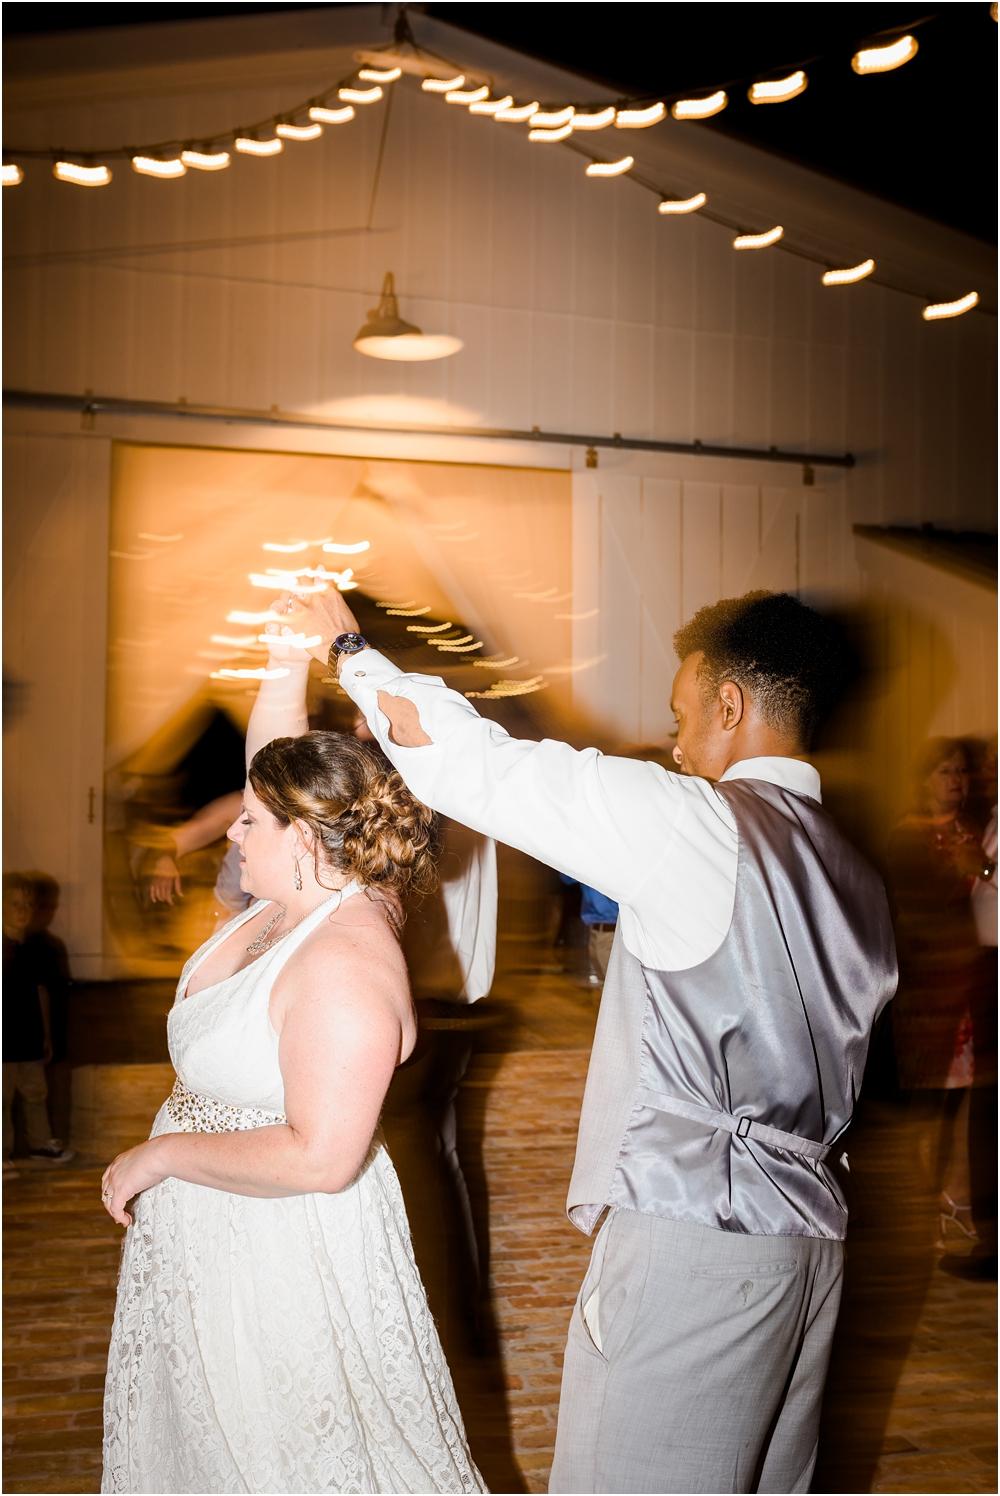 mosley-wedding-kiersten-stevenson-photography-30a-panama-city-beach-dothan-tallahassee-(444-of-472).JPG